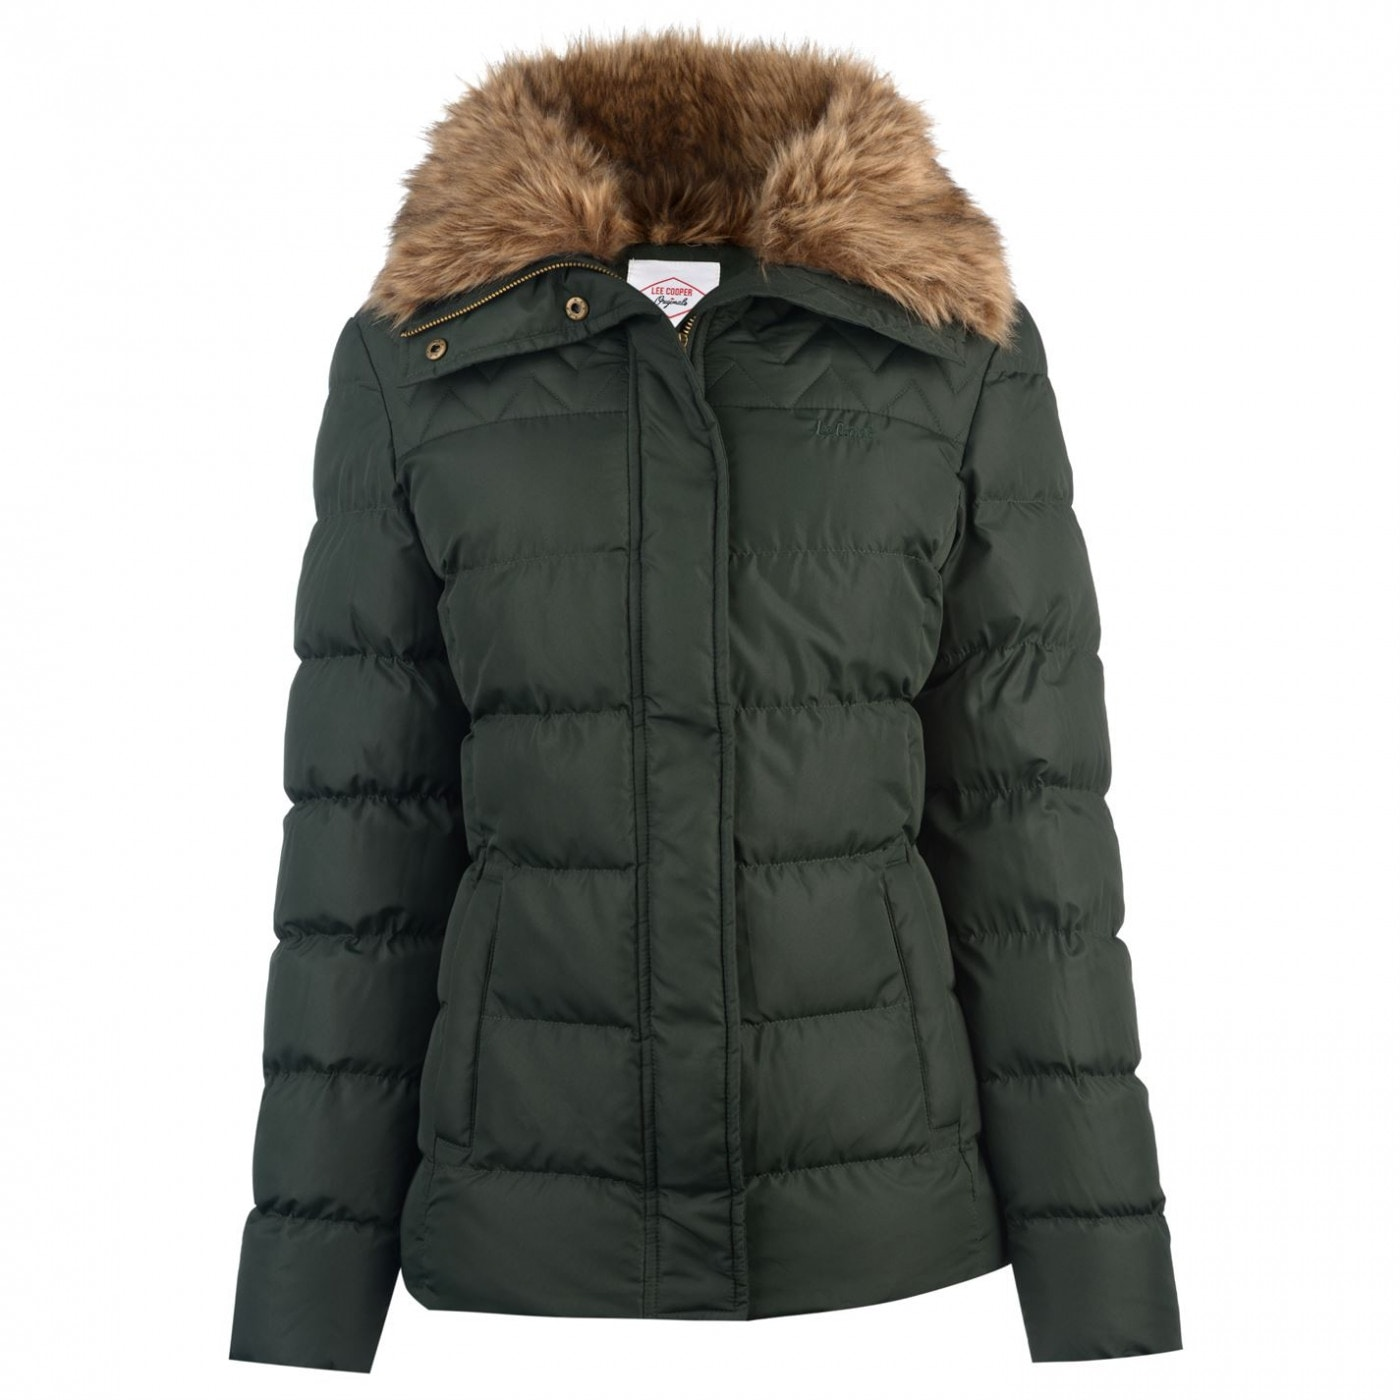 Lee Cooper Fur Collar Jacket Ladies